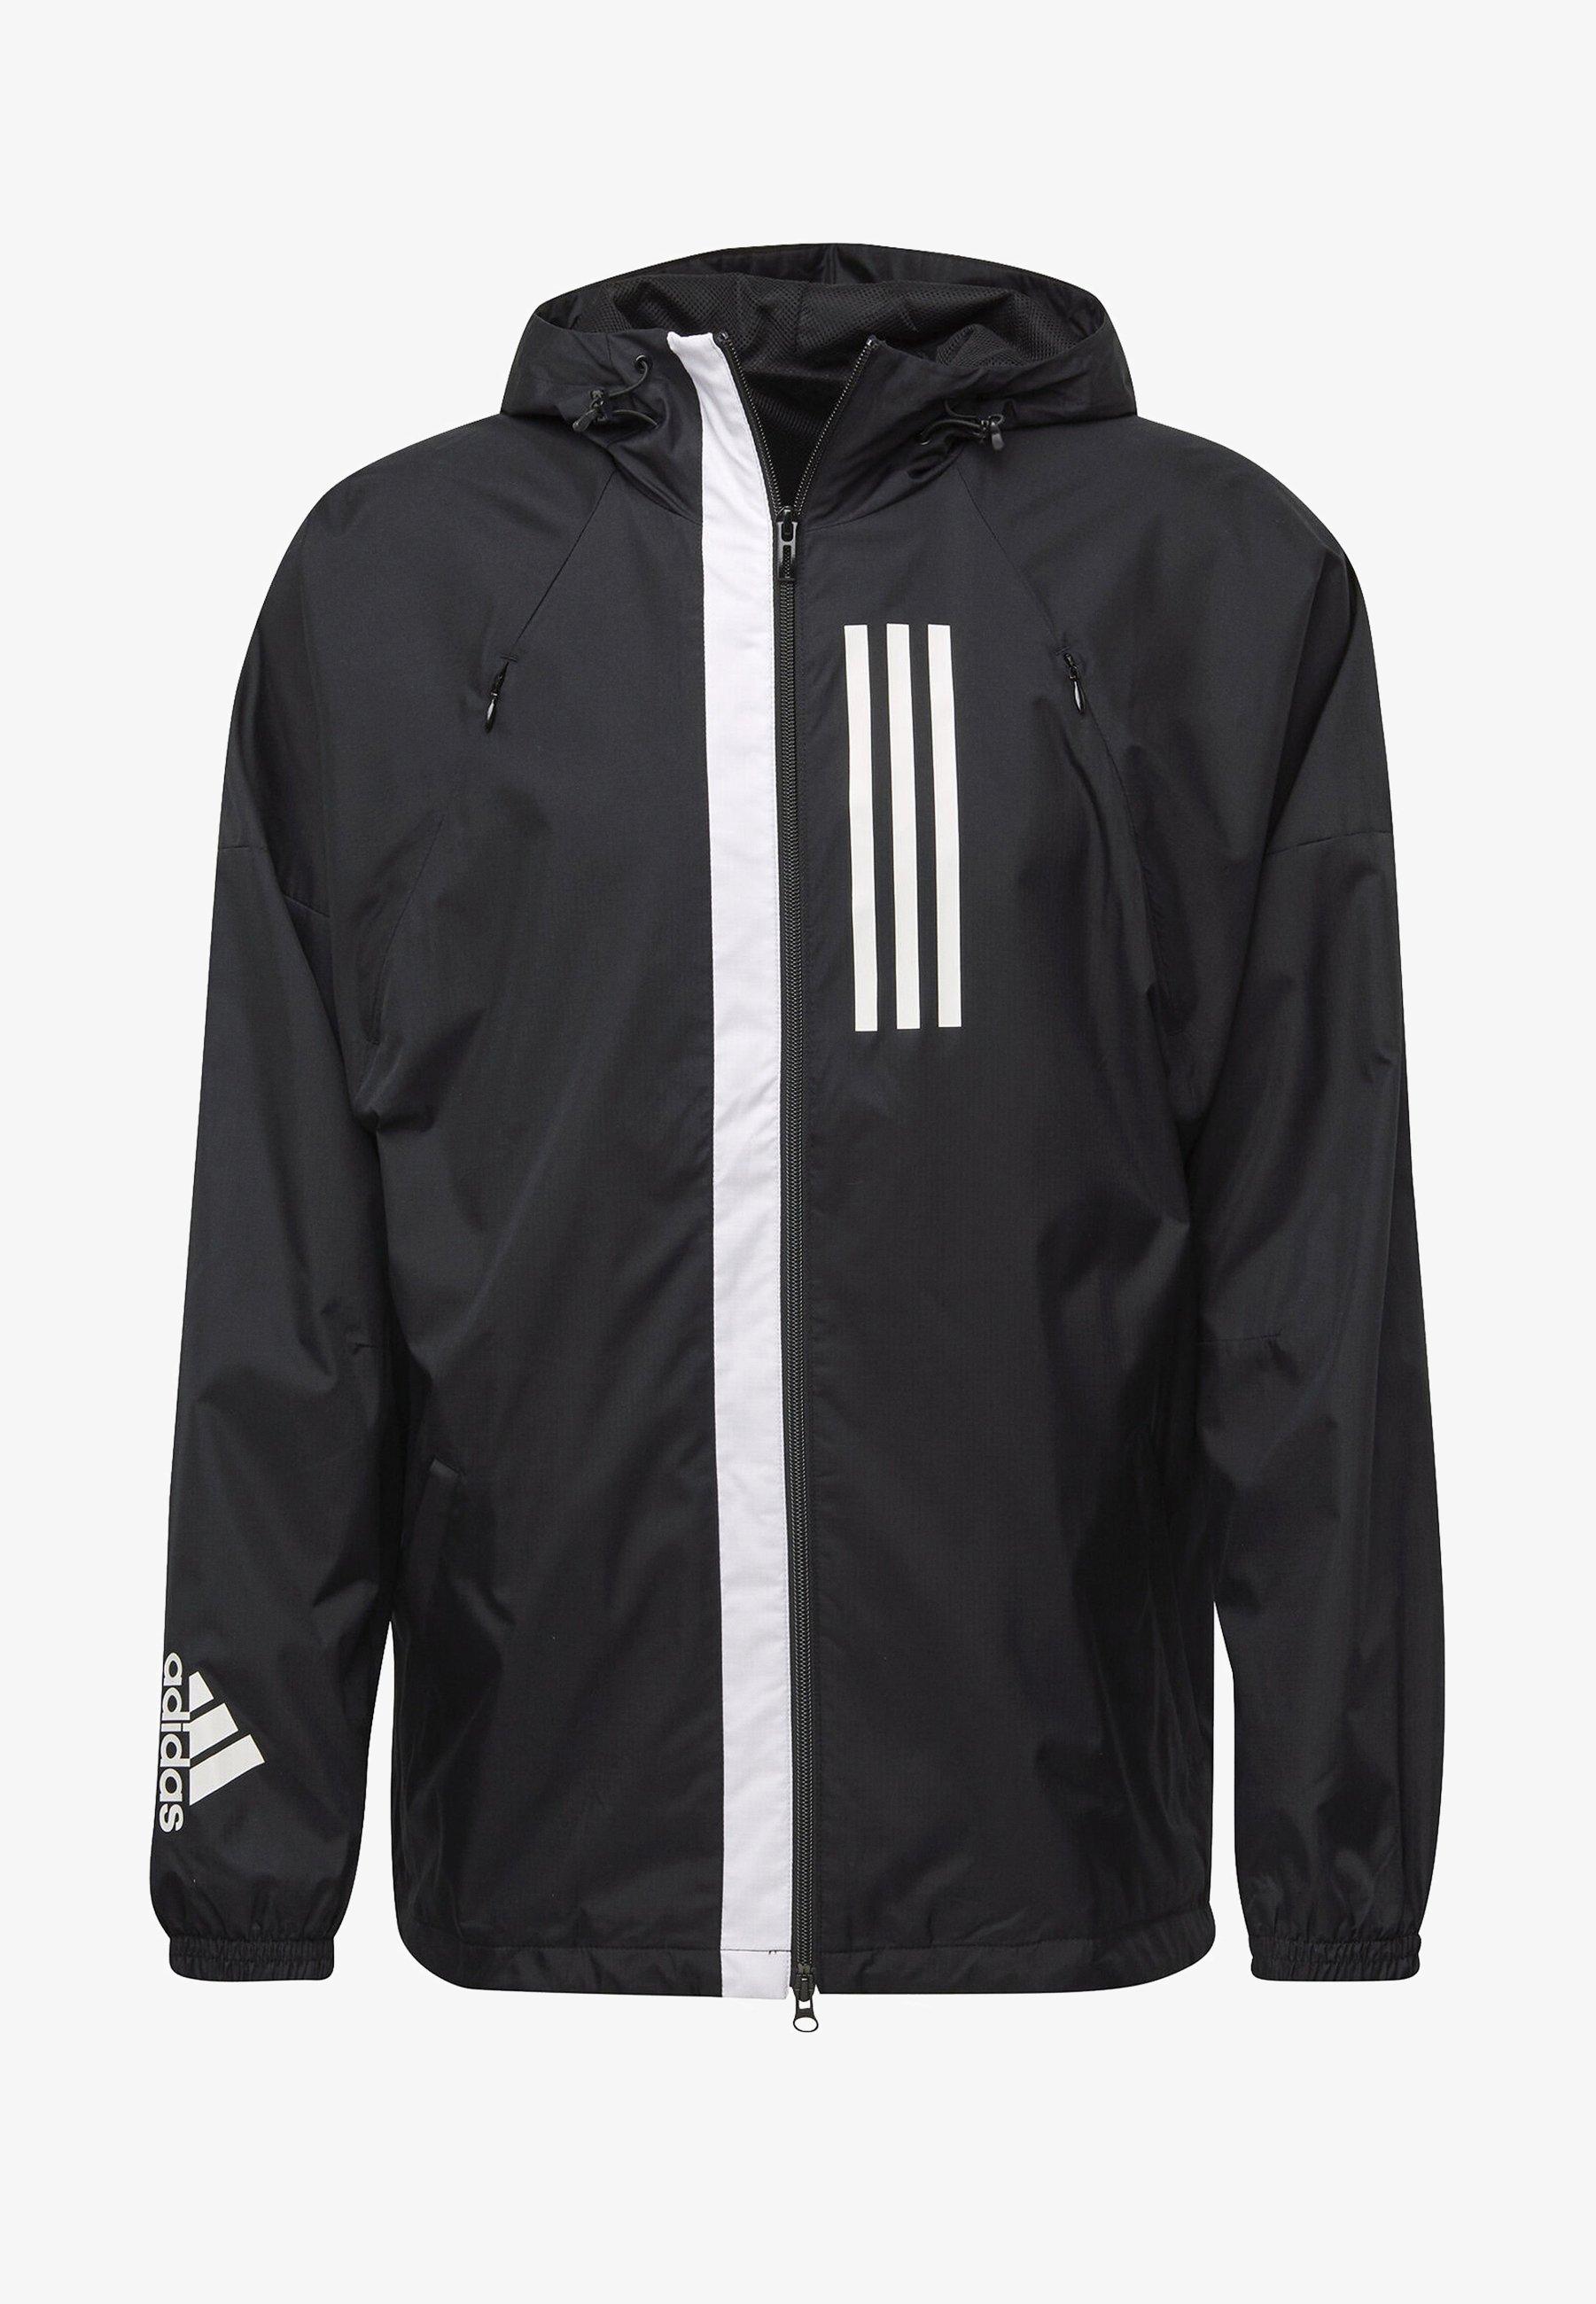 paridad Predecir filosofía  adidas Performance ADIDAS W.N.D. JACKET - Training jacket - black -  Zalando.de